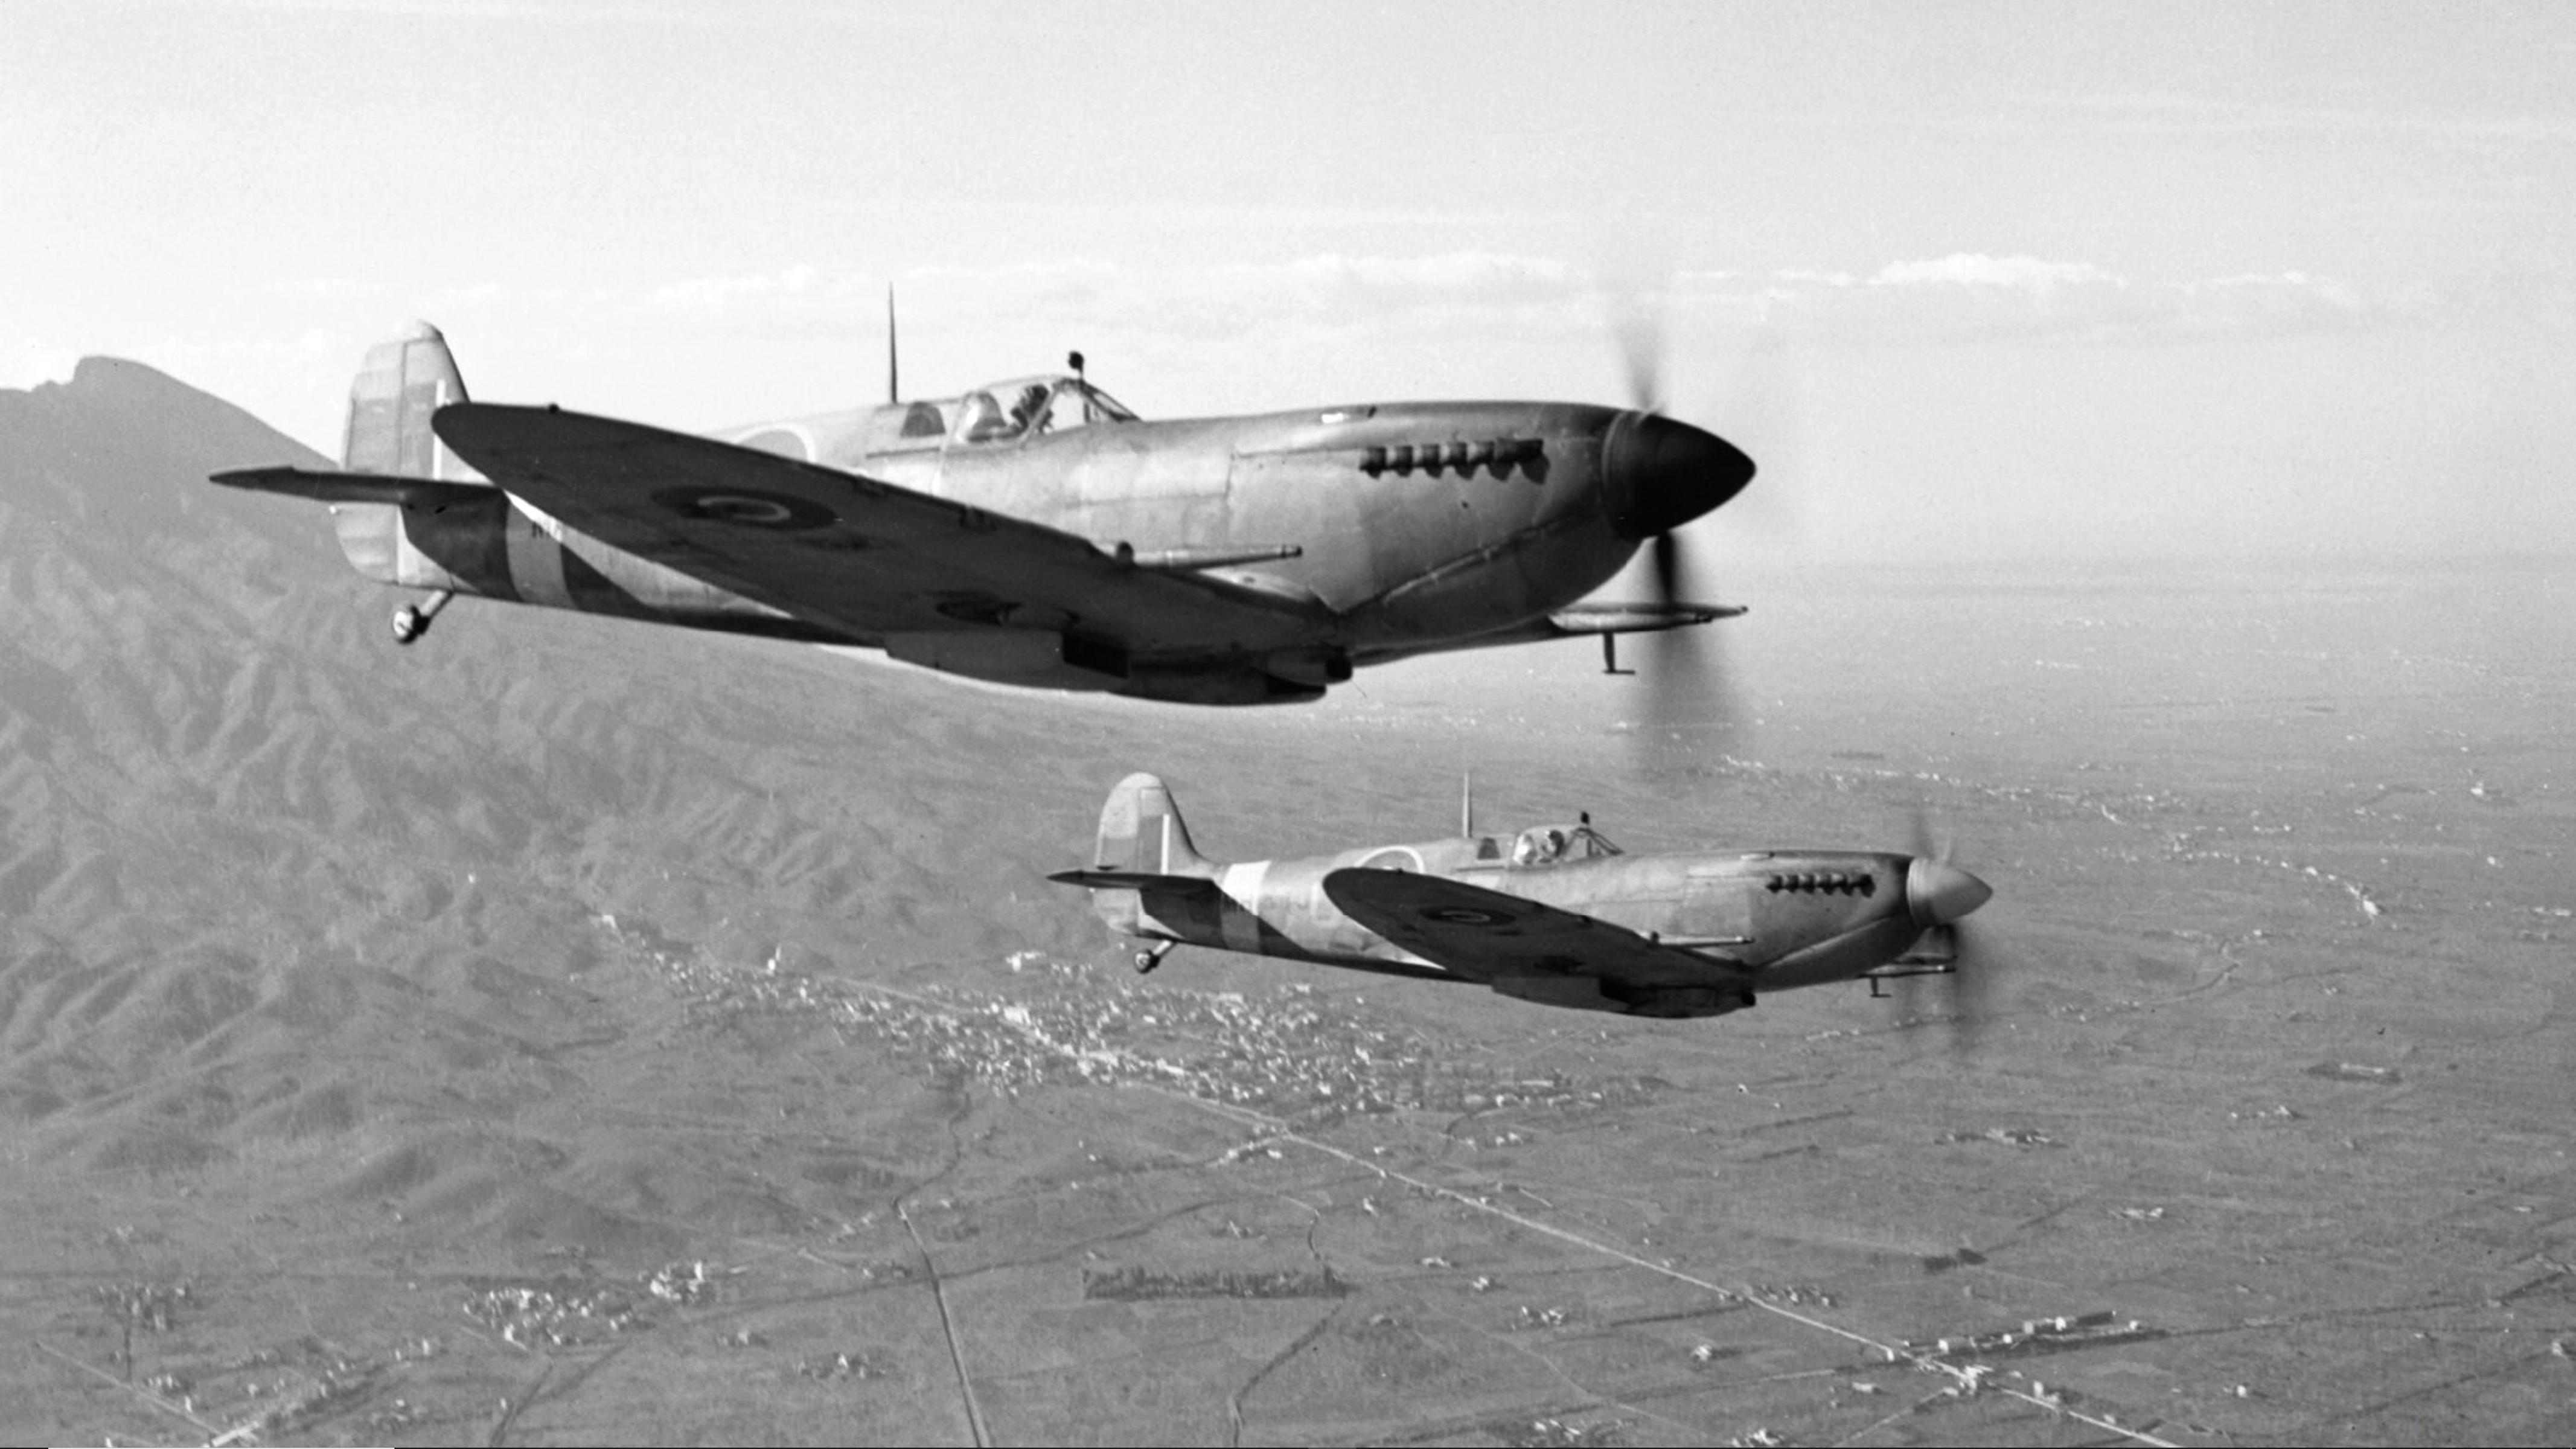 Spitfire MkIXe RAF 241Sqn RZR MA425 RZU MH635 over the Anzio beachhead Italy 1943 IWM CNA2499a